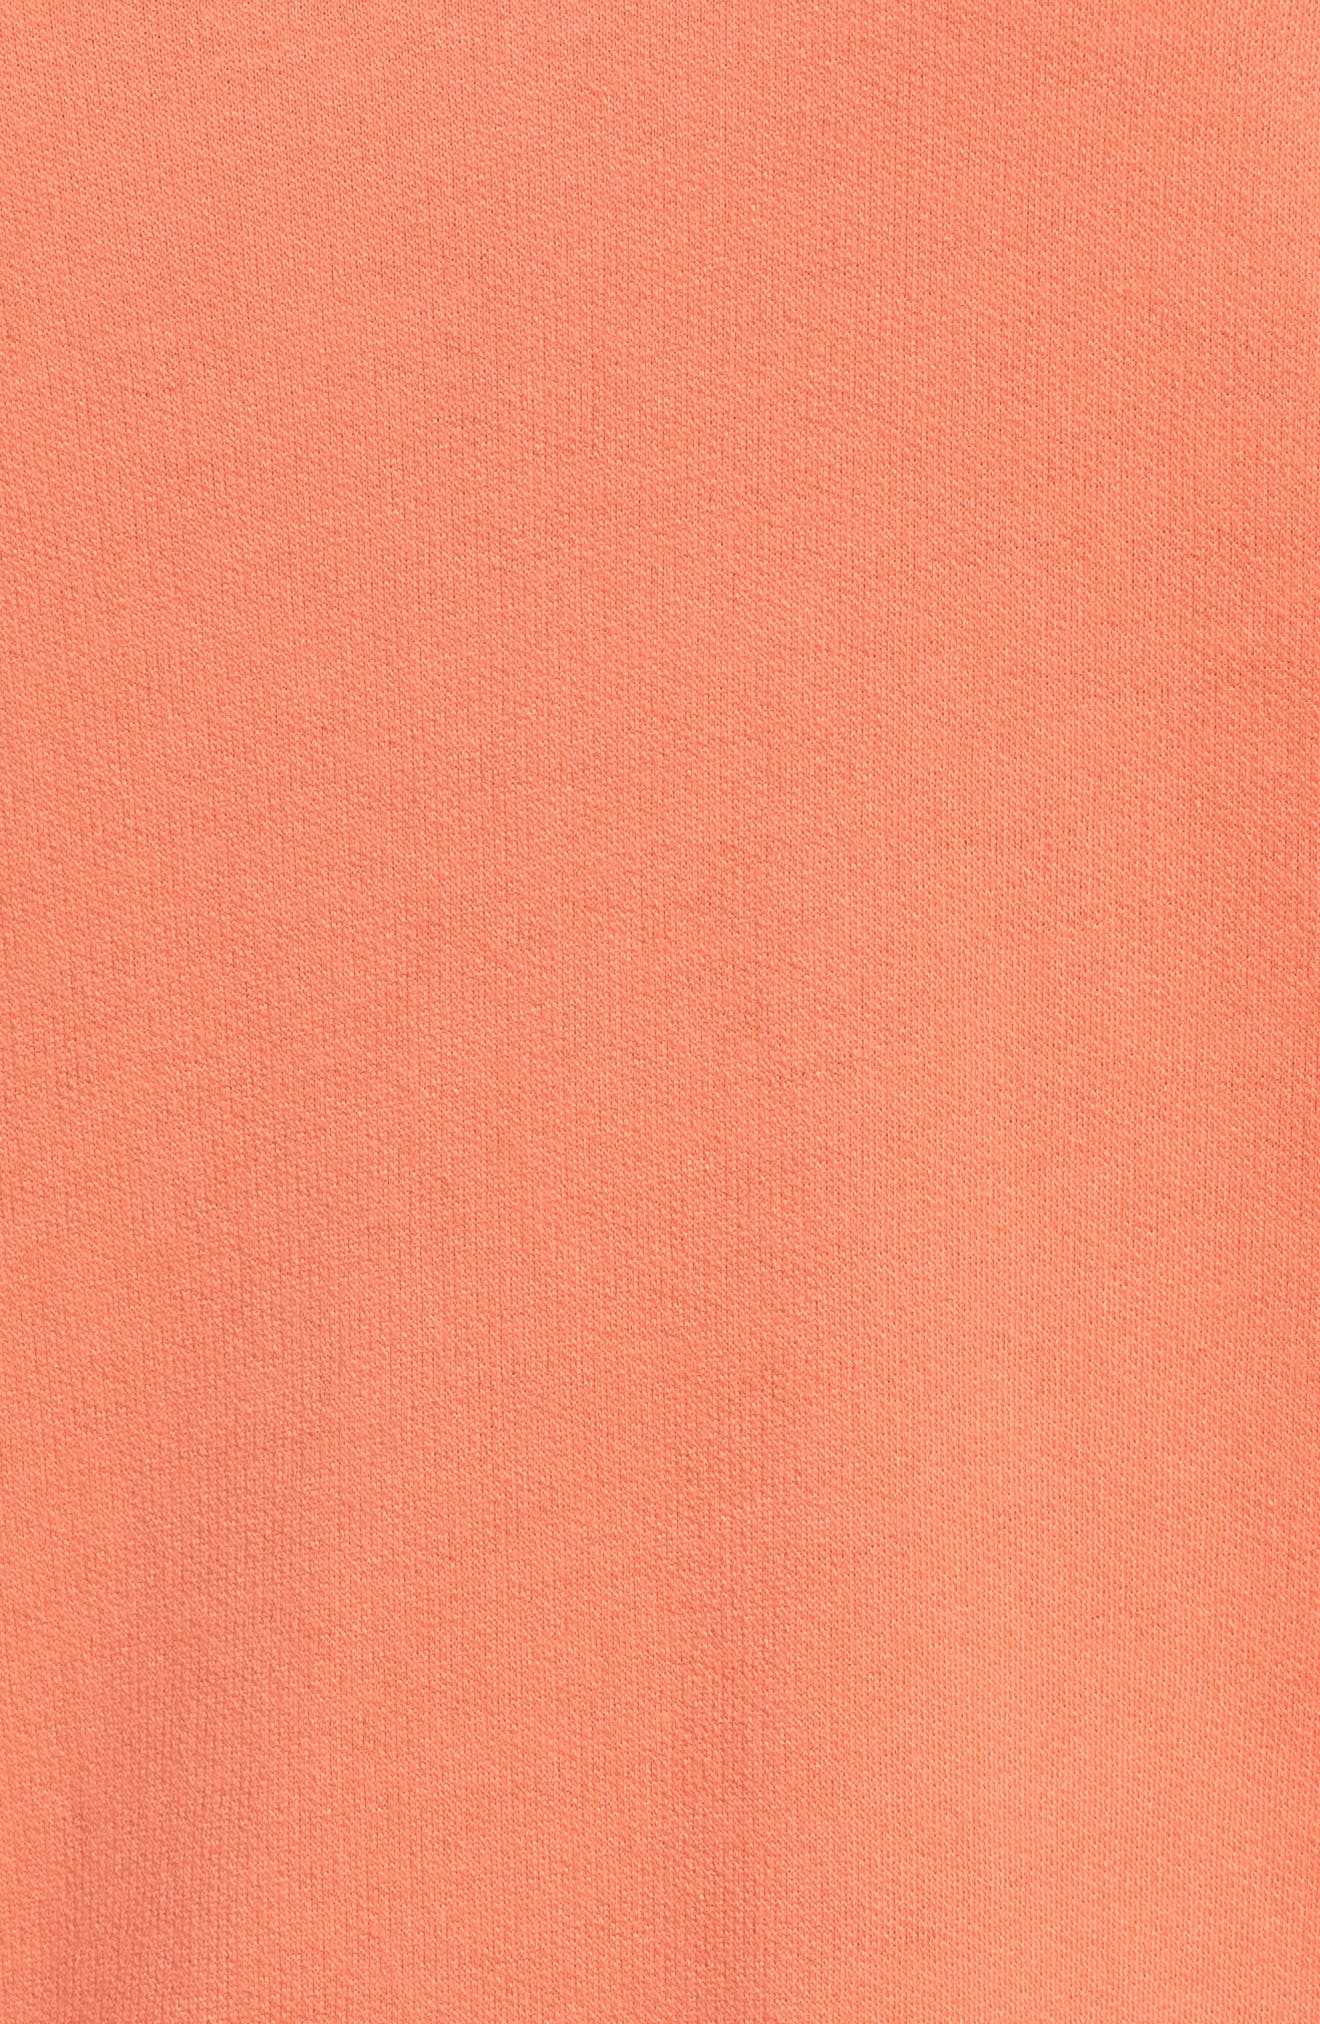 Cowl Neck Tunic Sweatshirt,                             Alternate thumbnail 5, color,                             Coral Sea